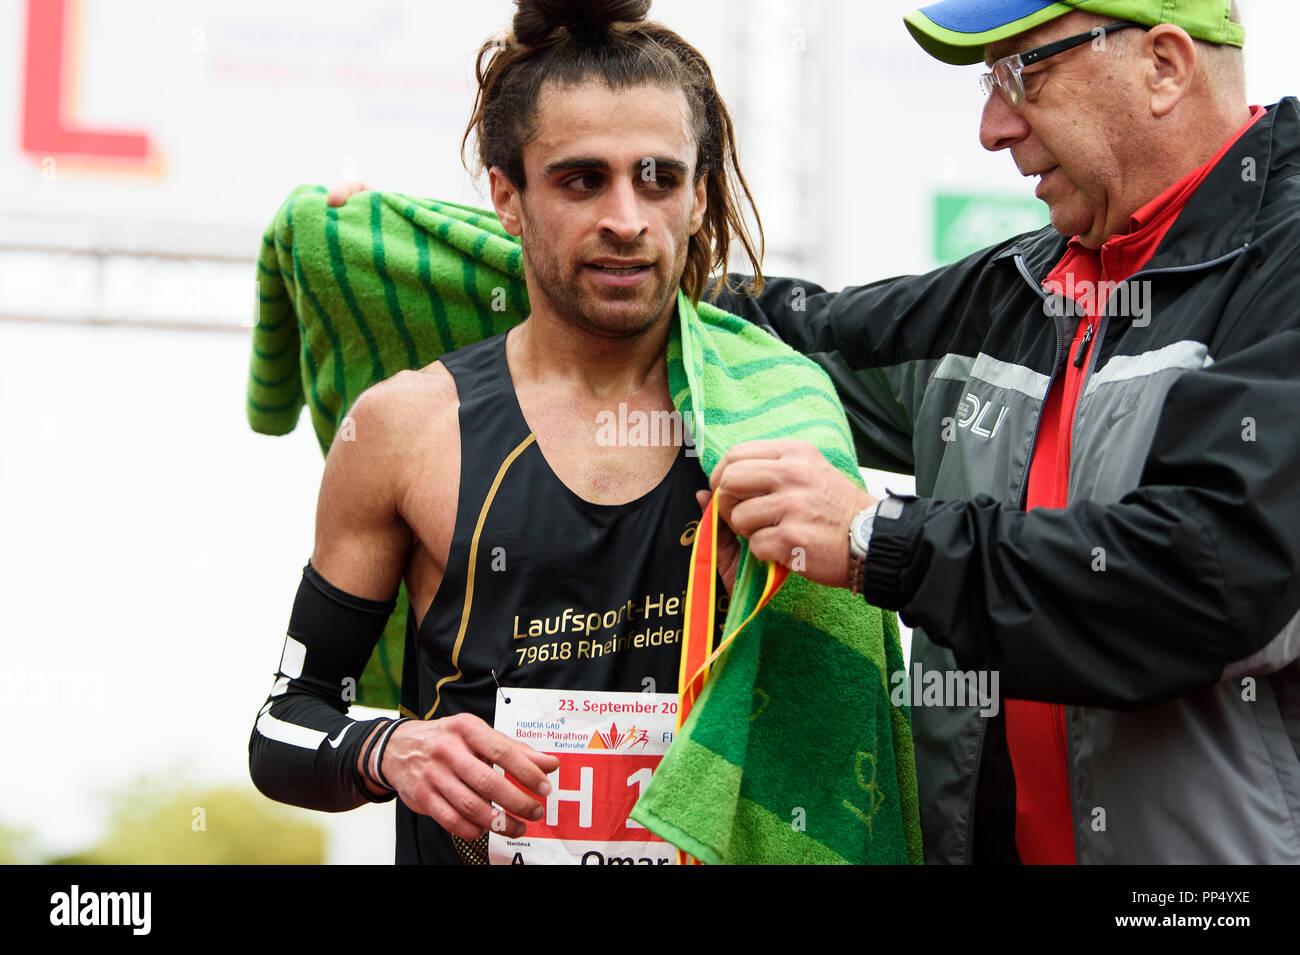 Karlsruhe, Germany. 23rd Sep, 2018. Winner half marathon Omar Tareq (TuS Loerrah Stetten/Laufsport Heinz). GES/Athletics/Baden-Marathon, 23.09.2018 | usage worldwide Credit: dpa/Alamy Live News - Stock Image